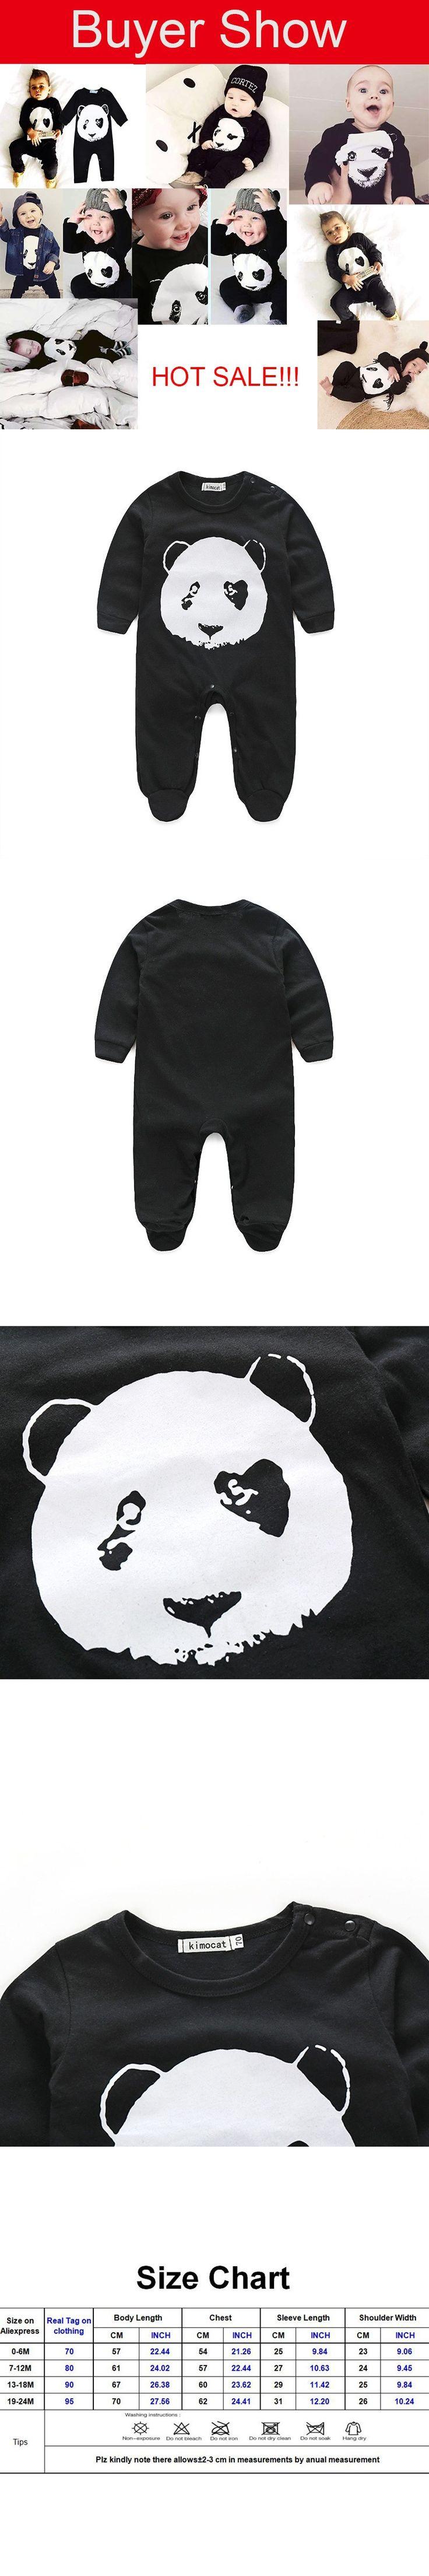 2016 Newborn Baby Boy Clothes Roupas Para Bebes Animal Jumpsuits Long Sleeve Panda Baby Romper Carters Children Clothing 2017